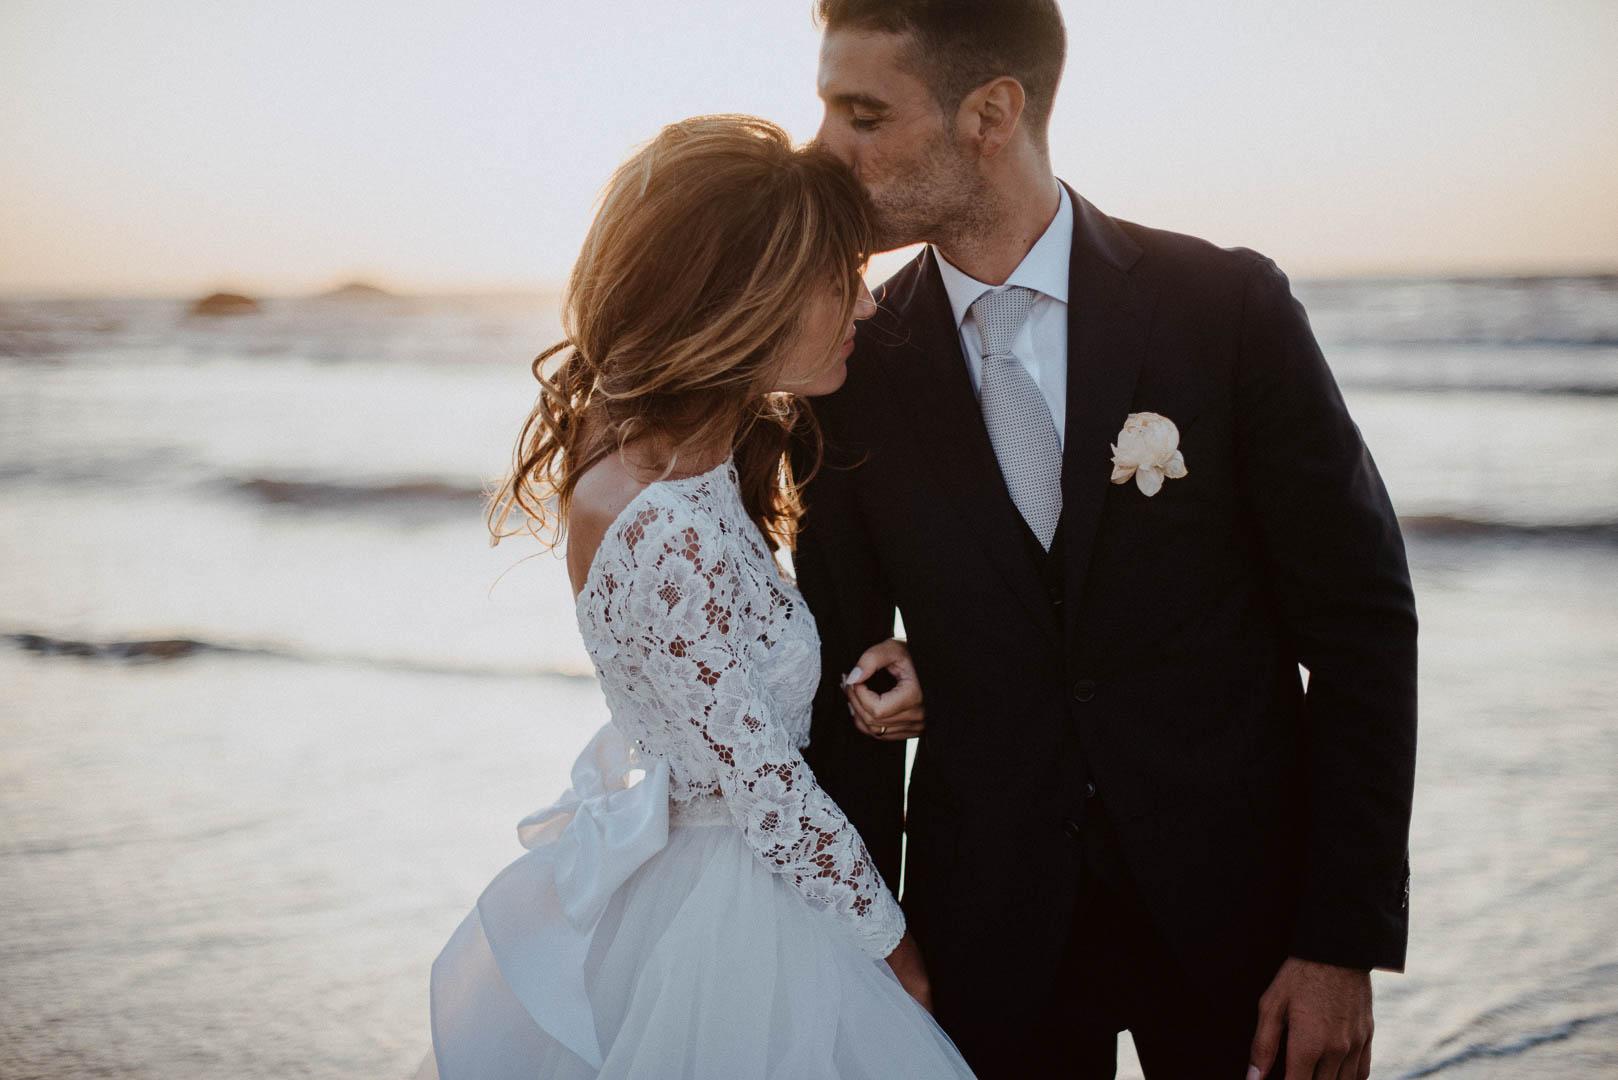 wedding-photographer-destination-fineart-bespoke-reportage-napoli-nabilah-vivianeizzo-spazio46-124